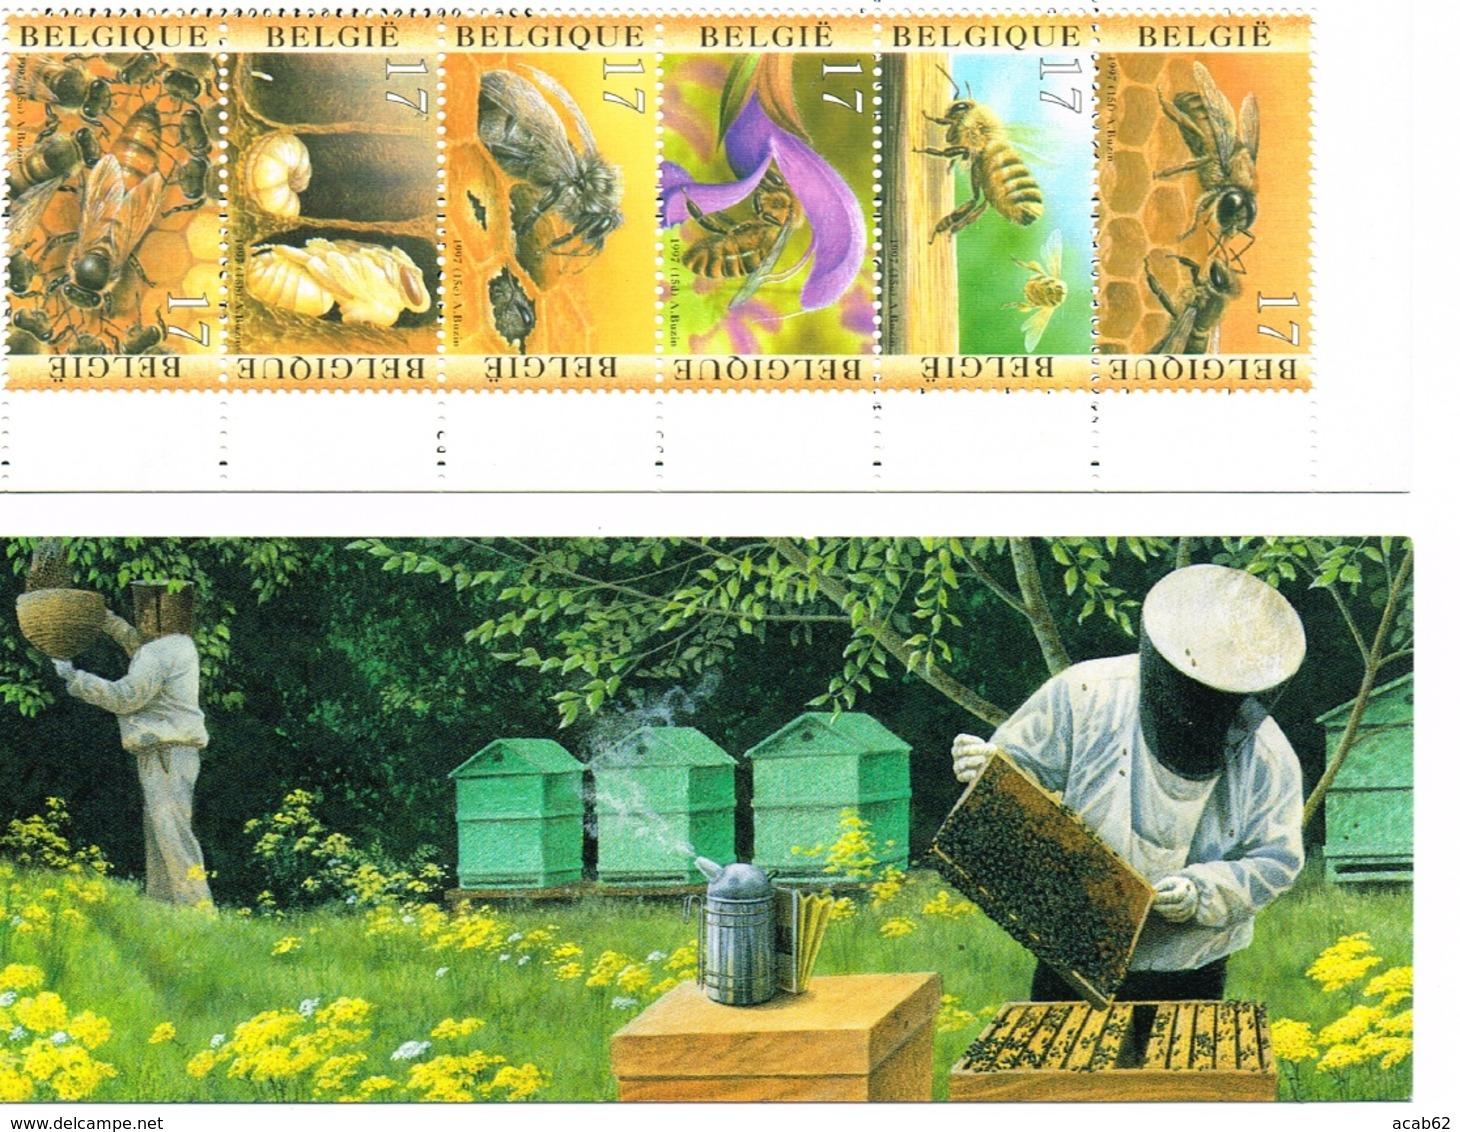 Belgique. Carnet Apiculture. Ruche. Abeille. Essaim. Apiculteur. - Honeybees